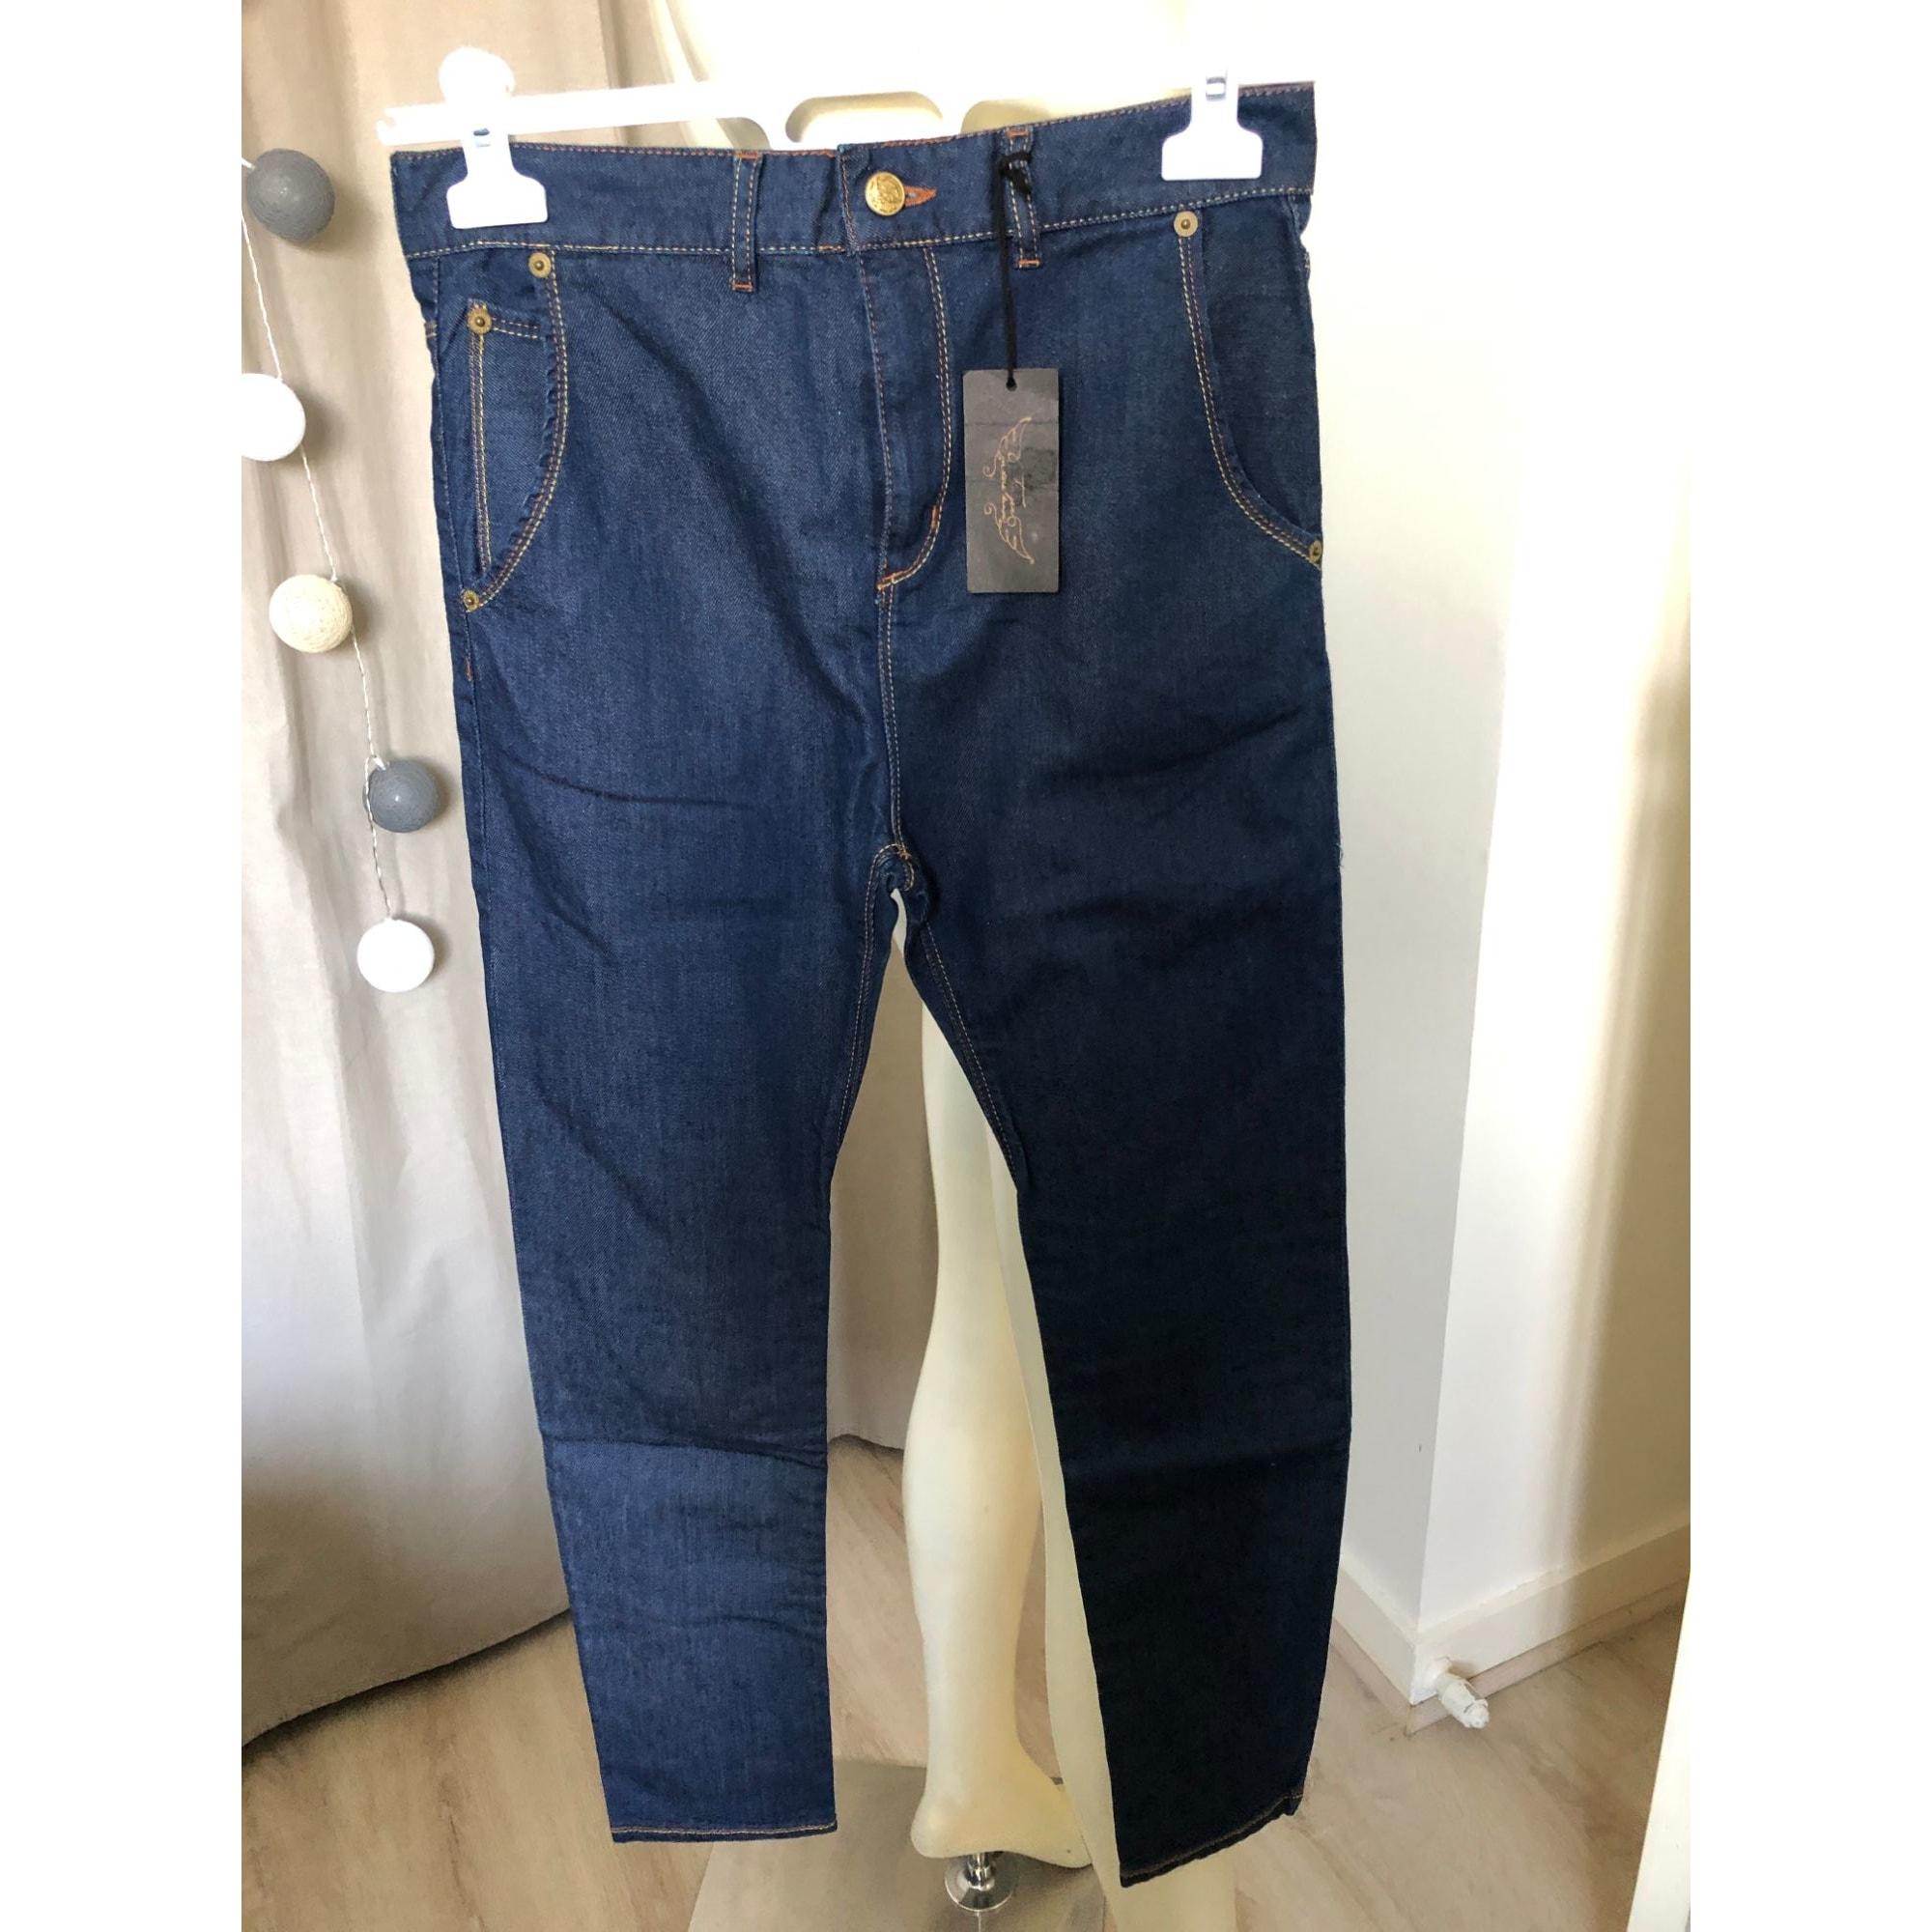 Pantalon FINGER IN THE NOSE Bleu, bleu marine, bleu turquoise